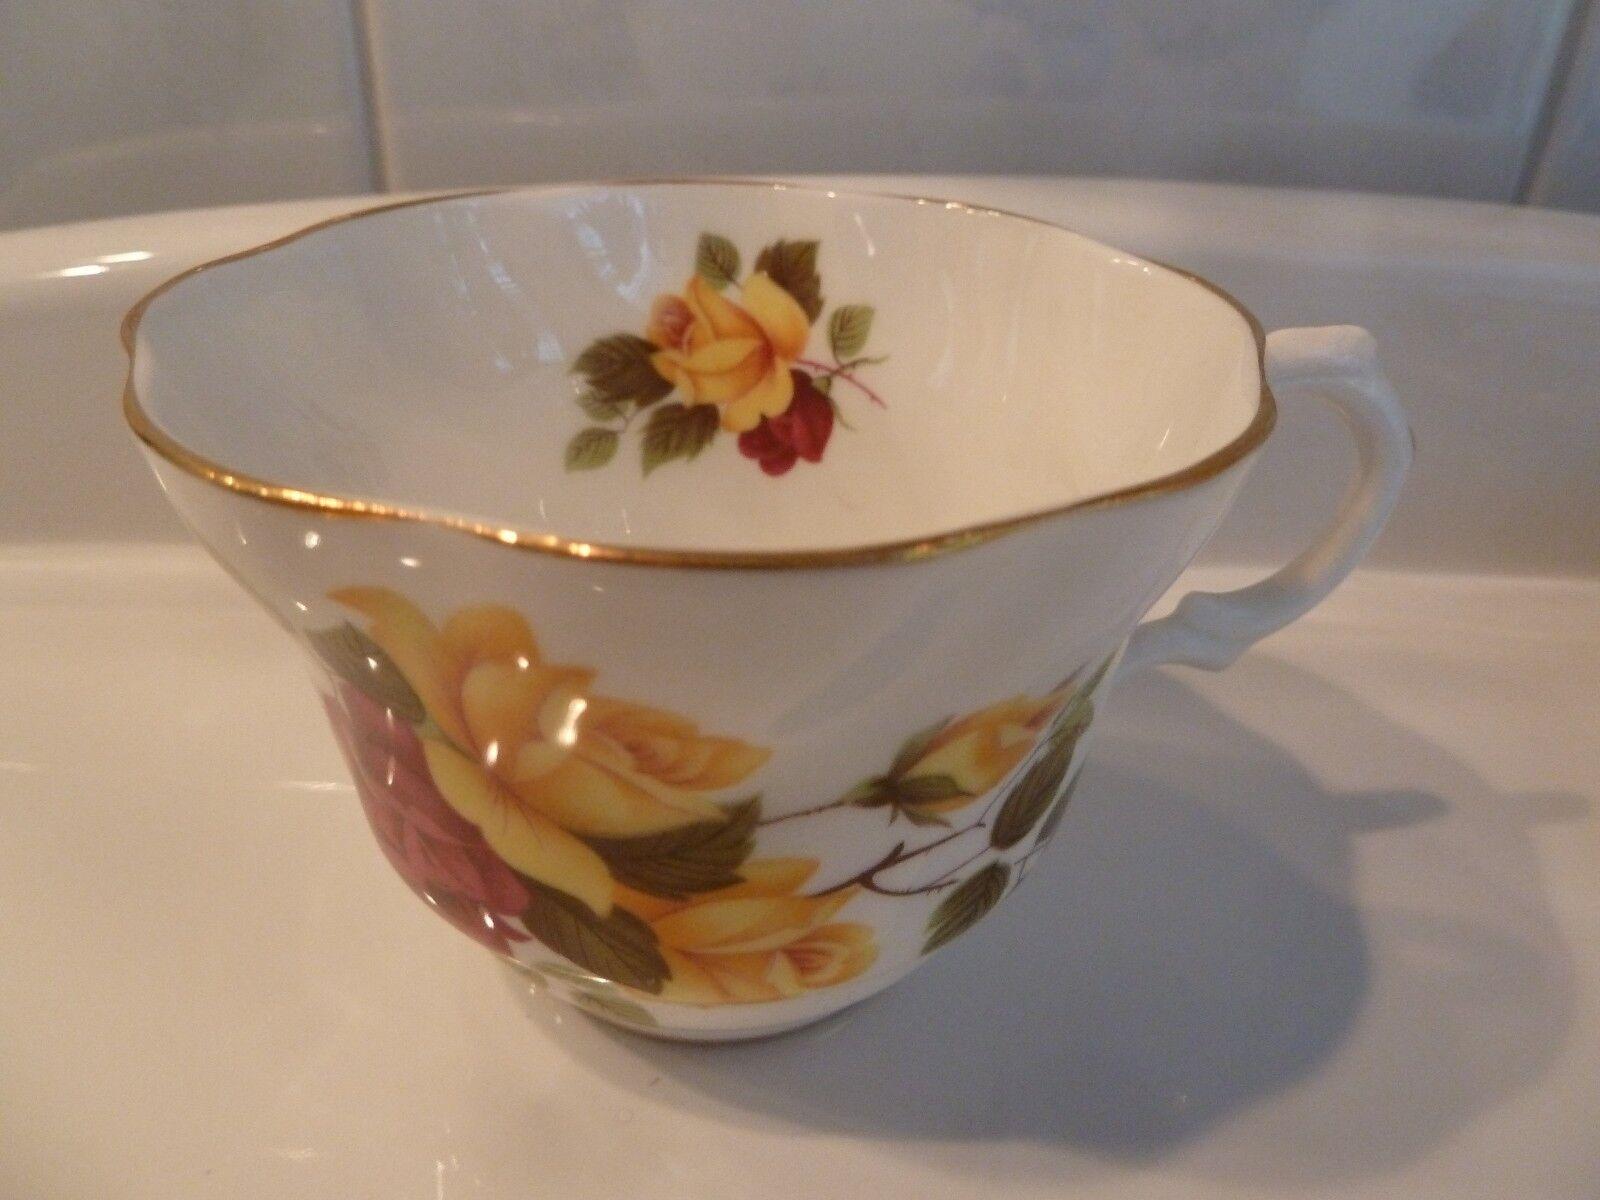 rosina roses tea cup and saucer set fine bone china england ec picclick. Black Bedroom Furniture Sets. Home Design Ideas